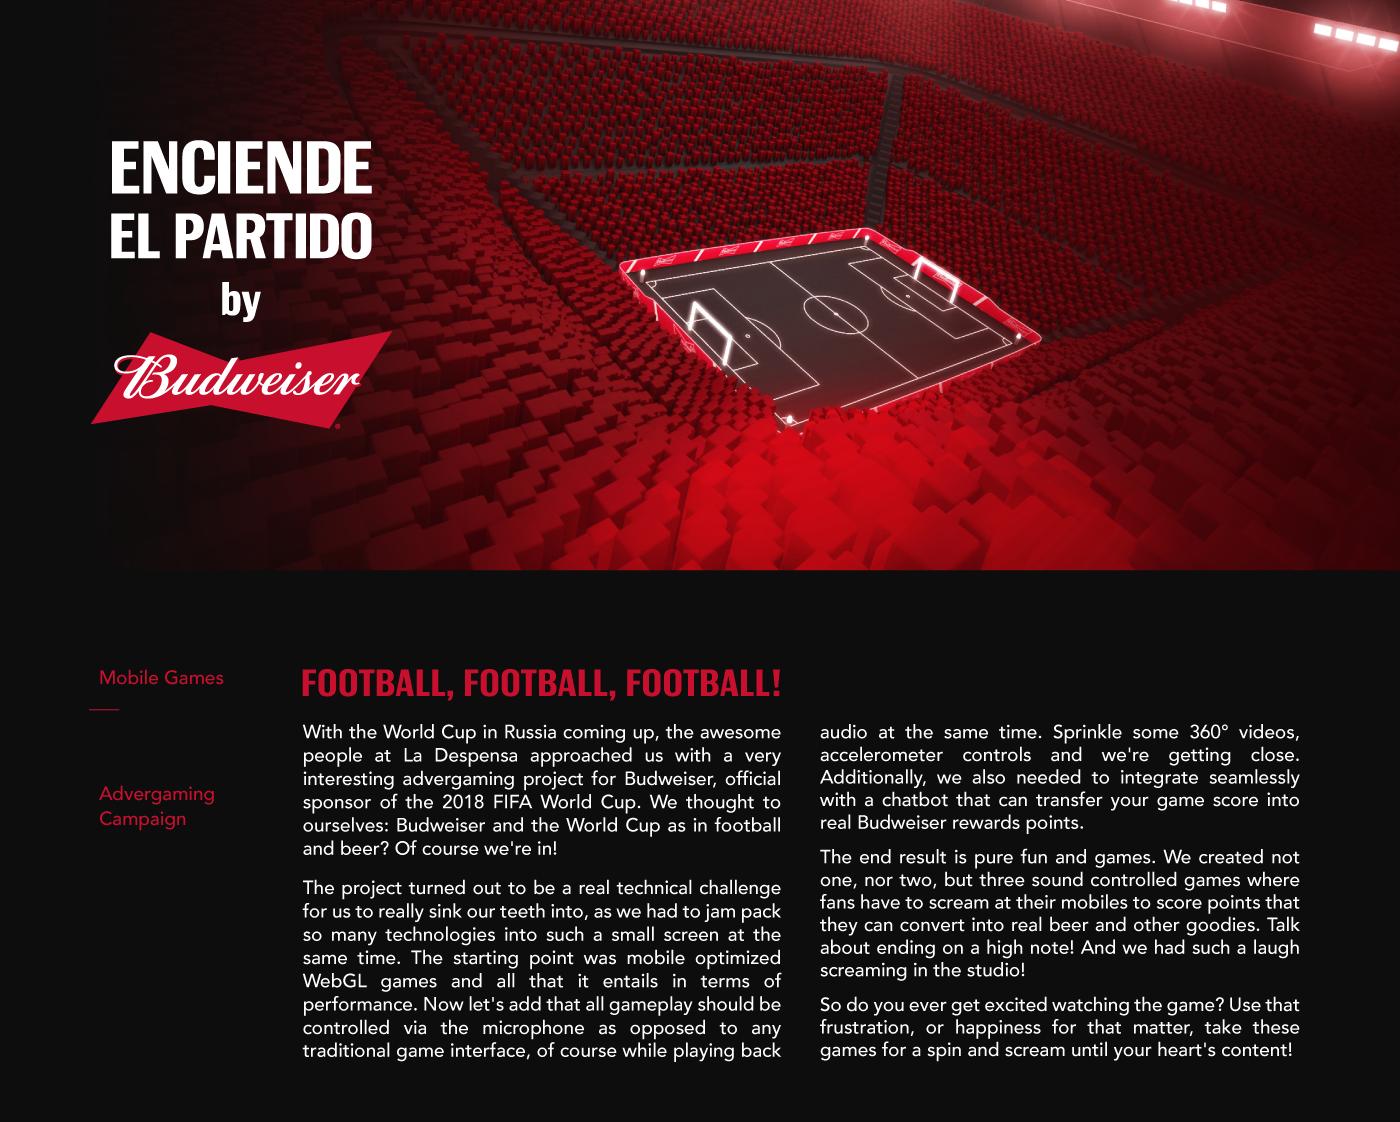 football FIFA stadium scream advergaming development mobile lights sports arcade